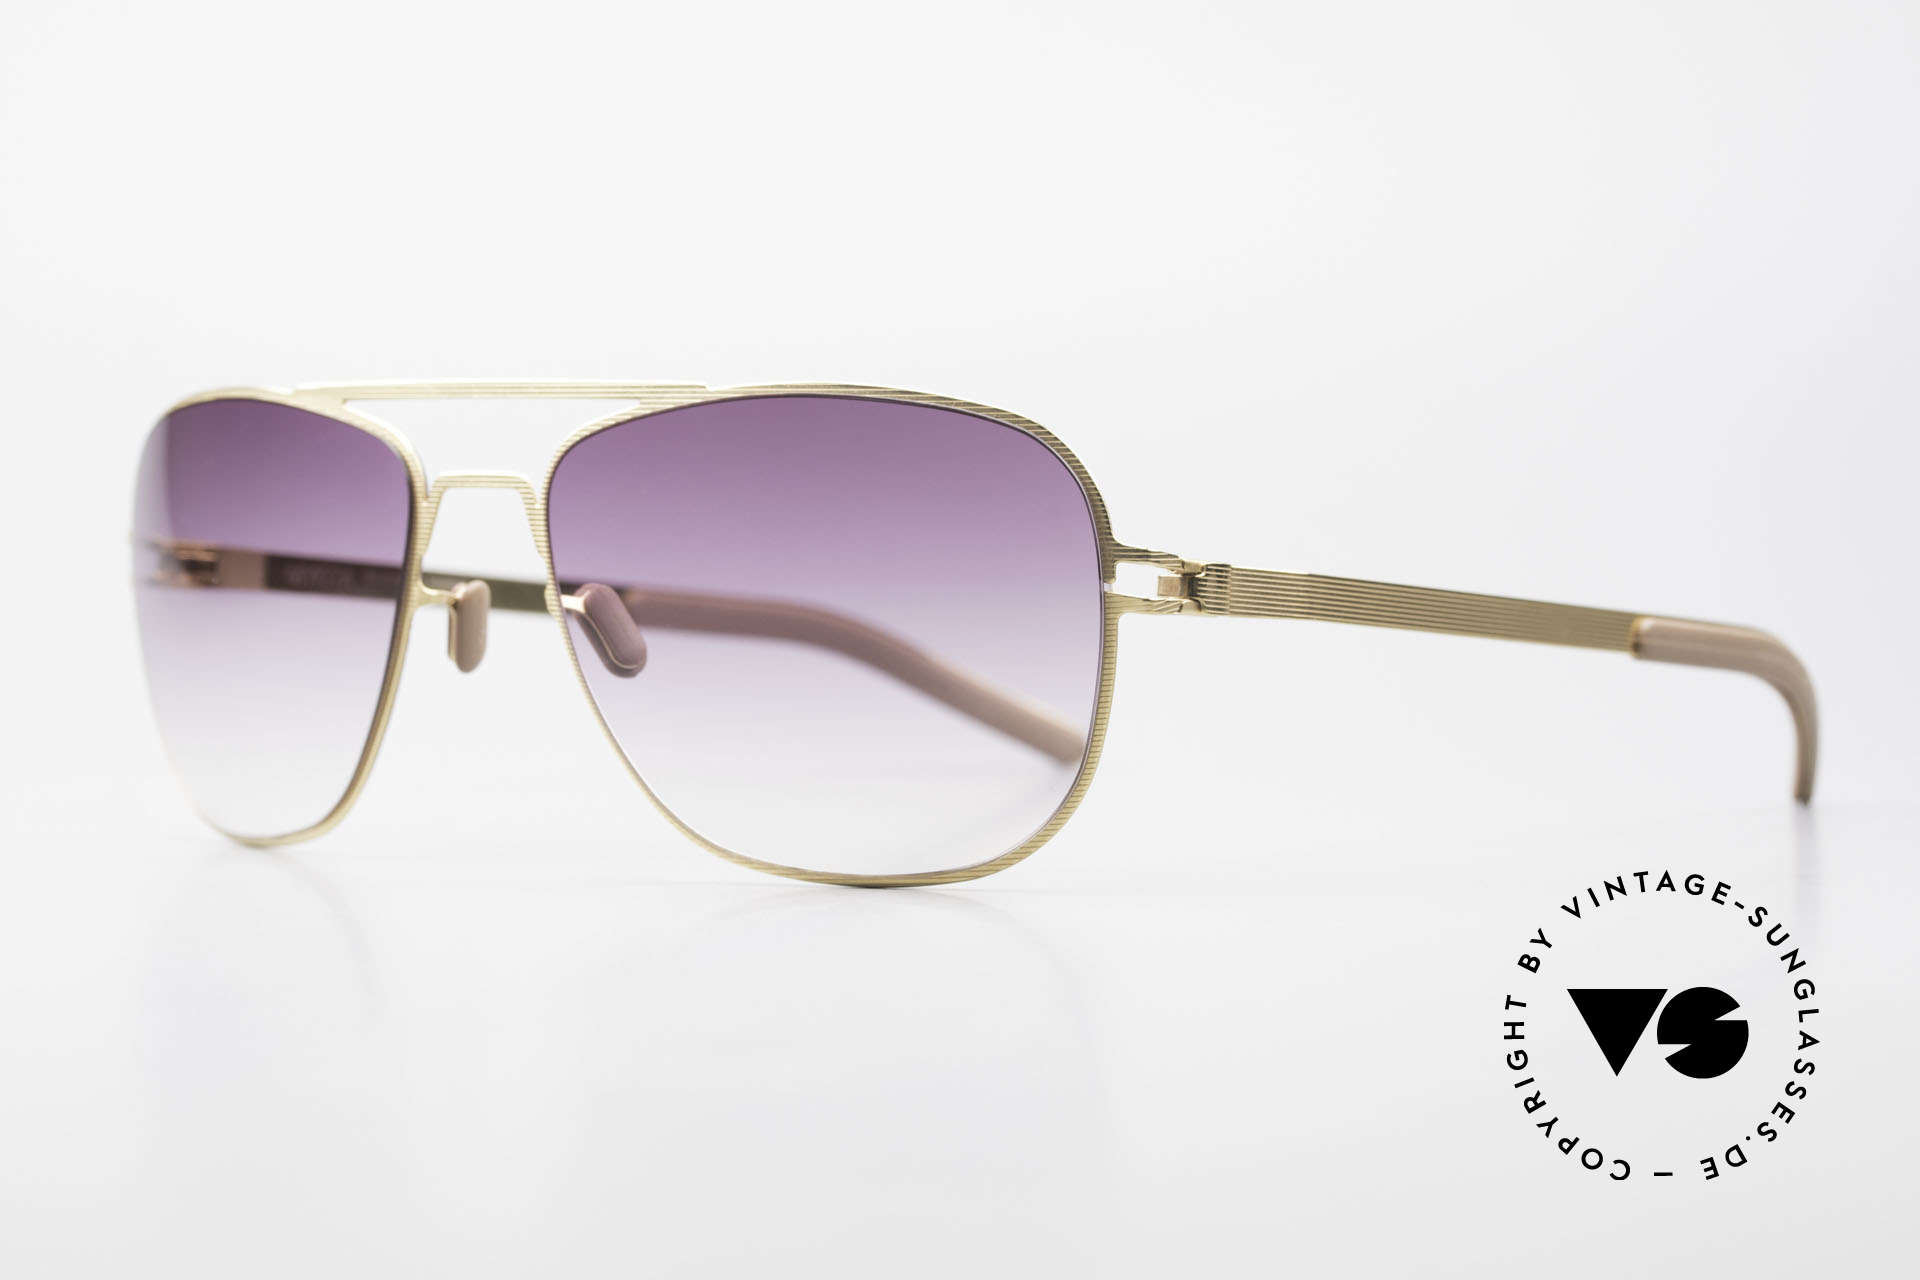 Mykita Howard Vintage Unisex Mykita Shades, Mod. No.1 Sun Howard Goldline, purple-gradient, 58/18, Made for Men and Women